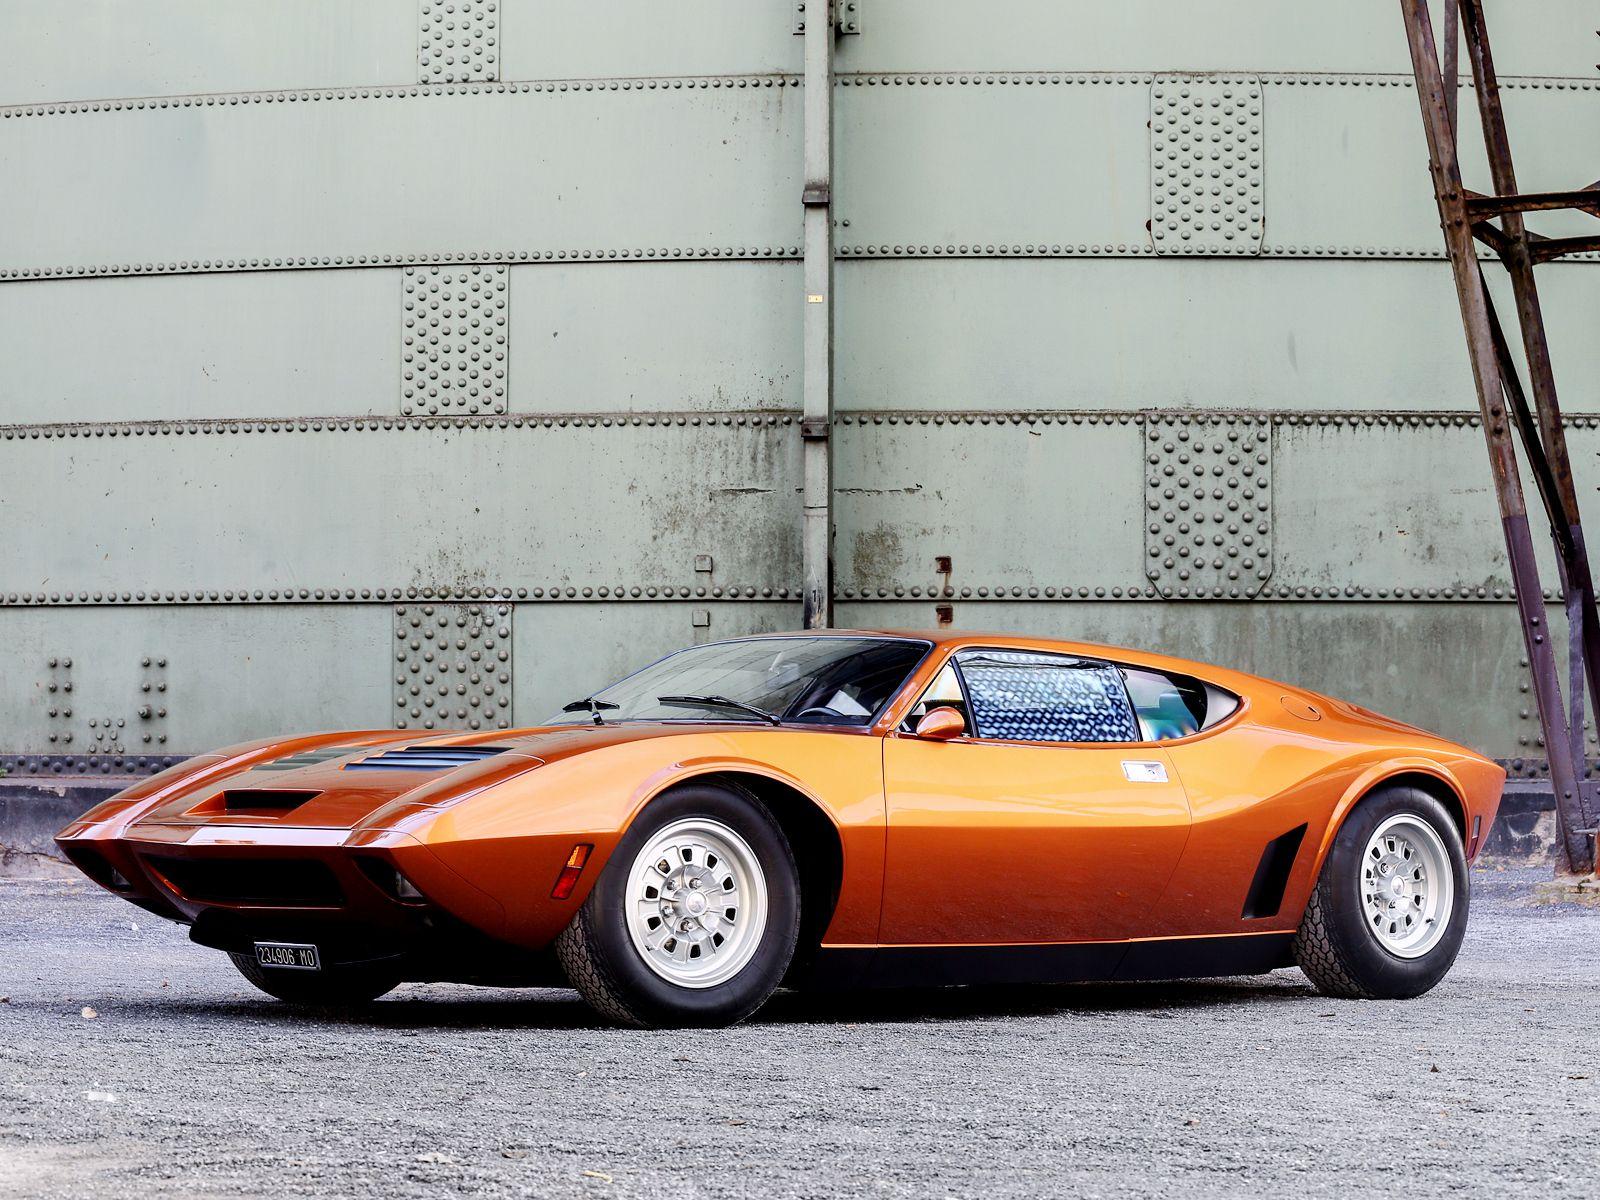 Supercars Latest News Photos Videos Super Cars Vintage Sports Cars American Motors